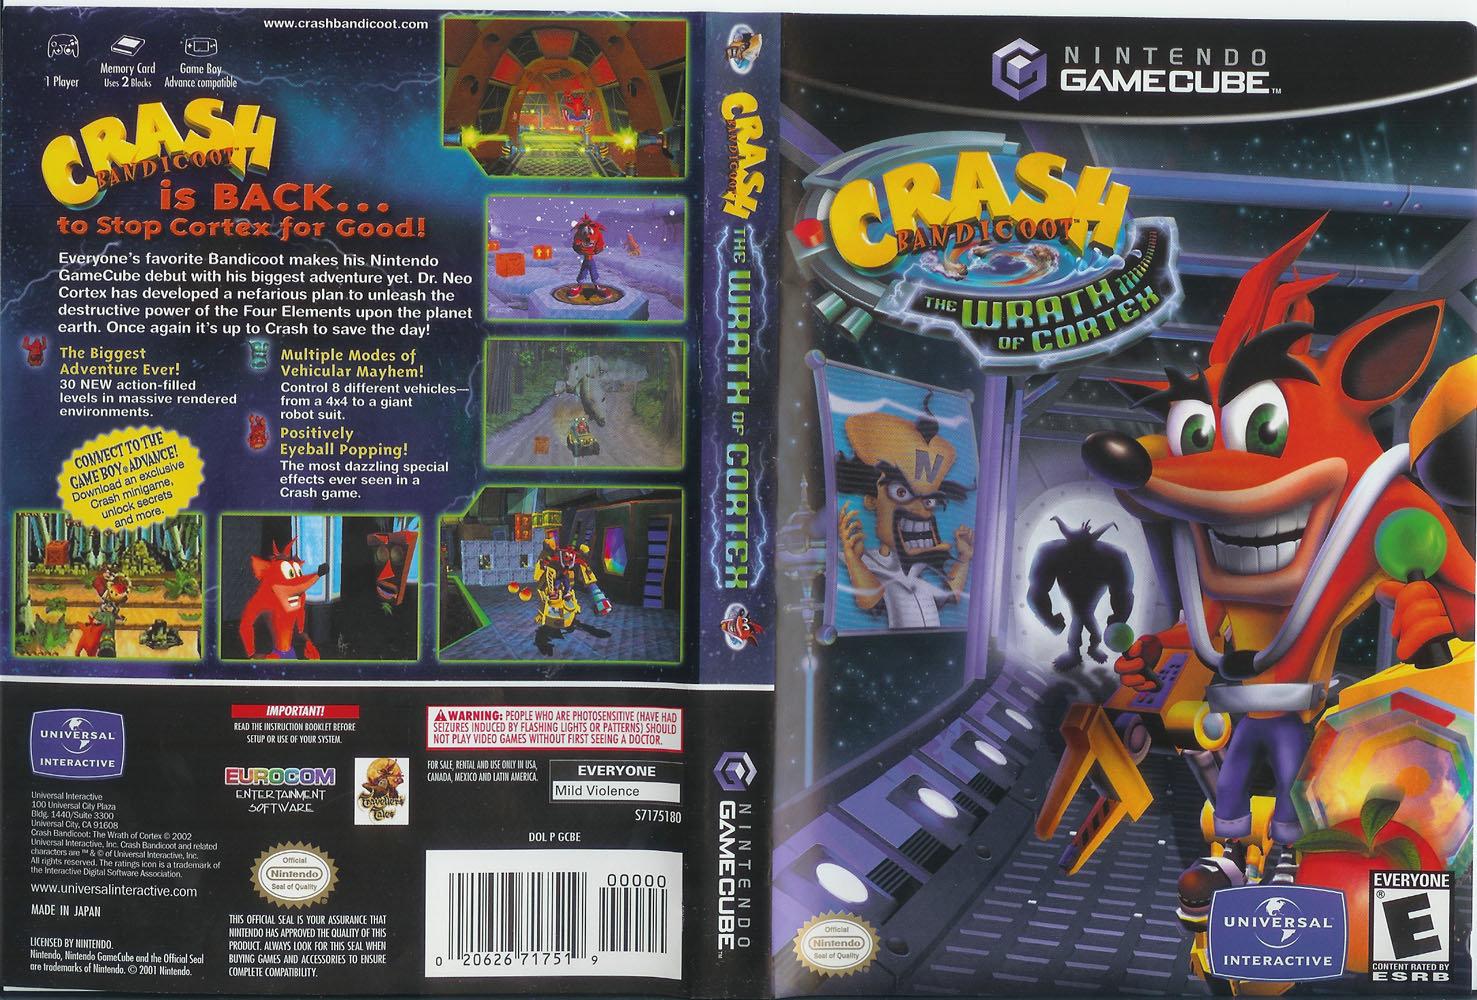 تحميل لعبة crash twinsanity ps2 برابط واحد